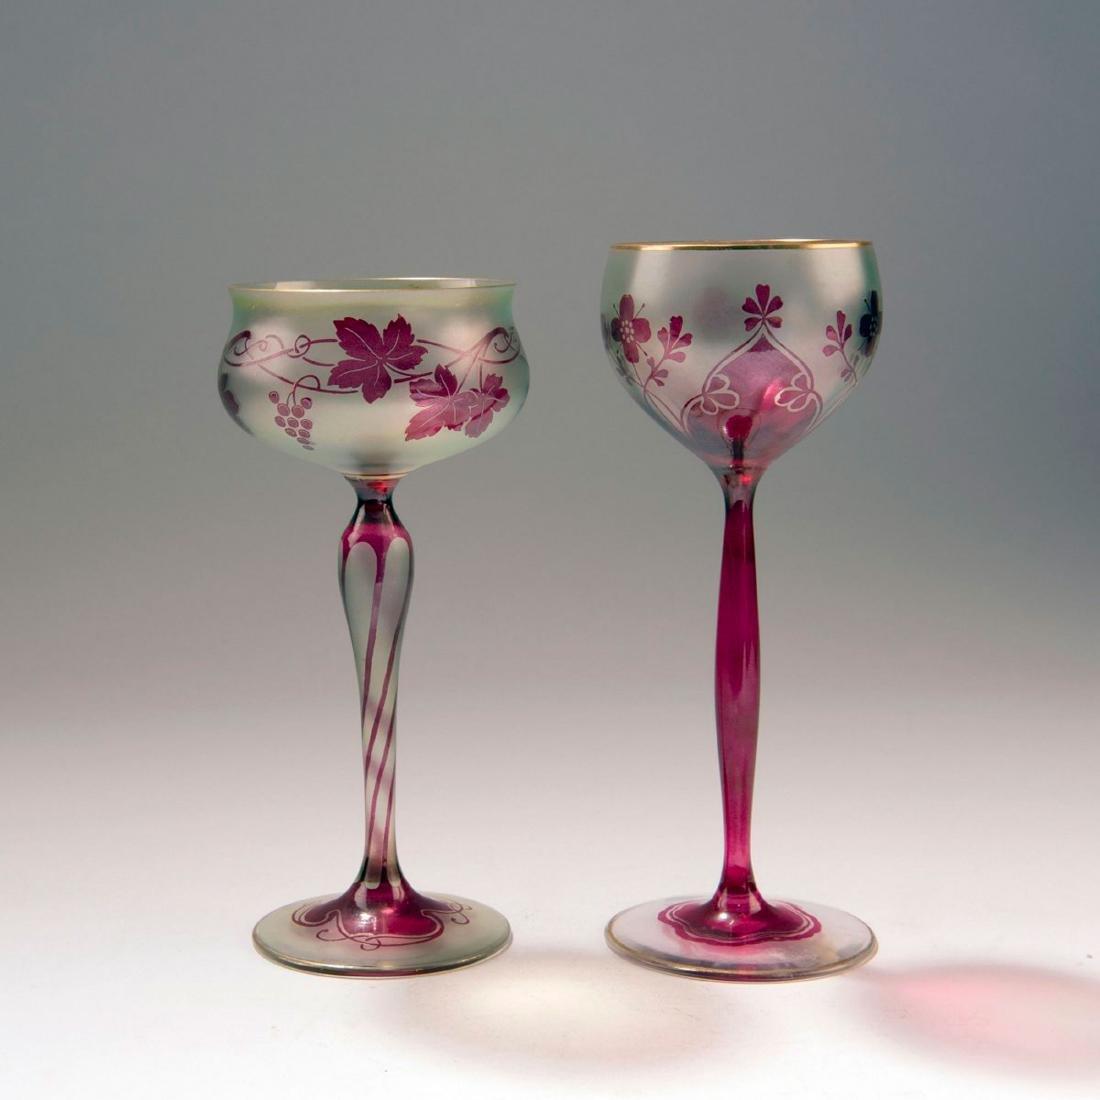 Two wine glasses, c. 1900